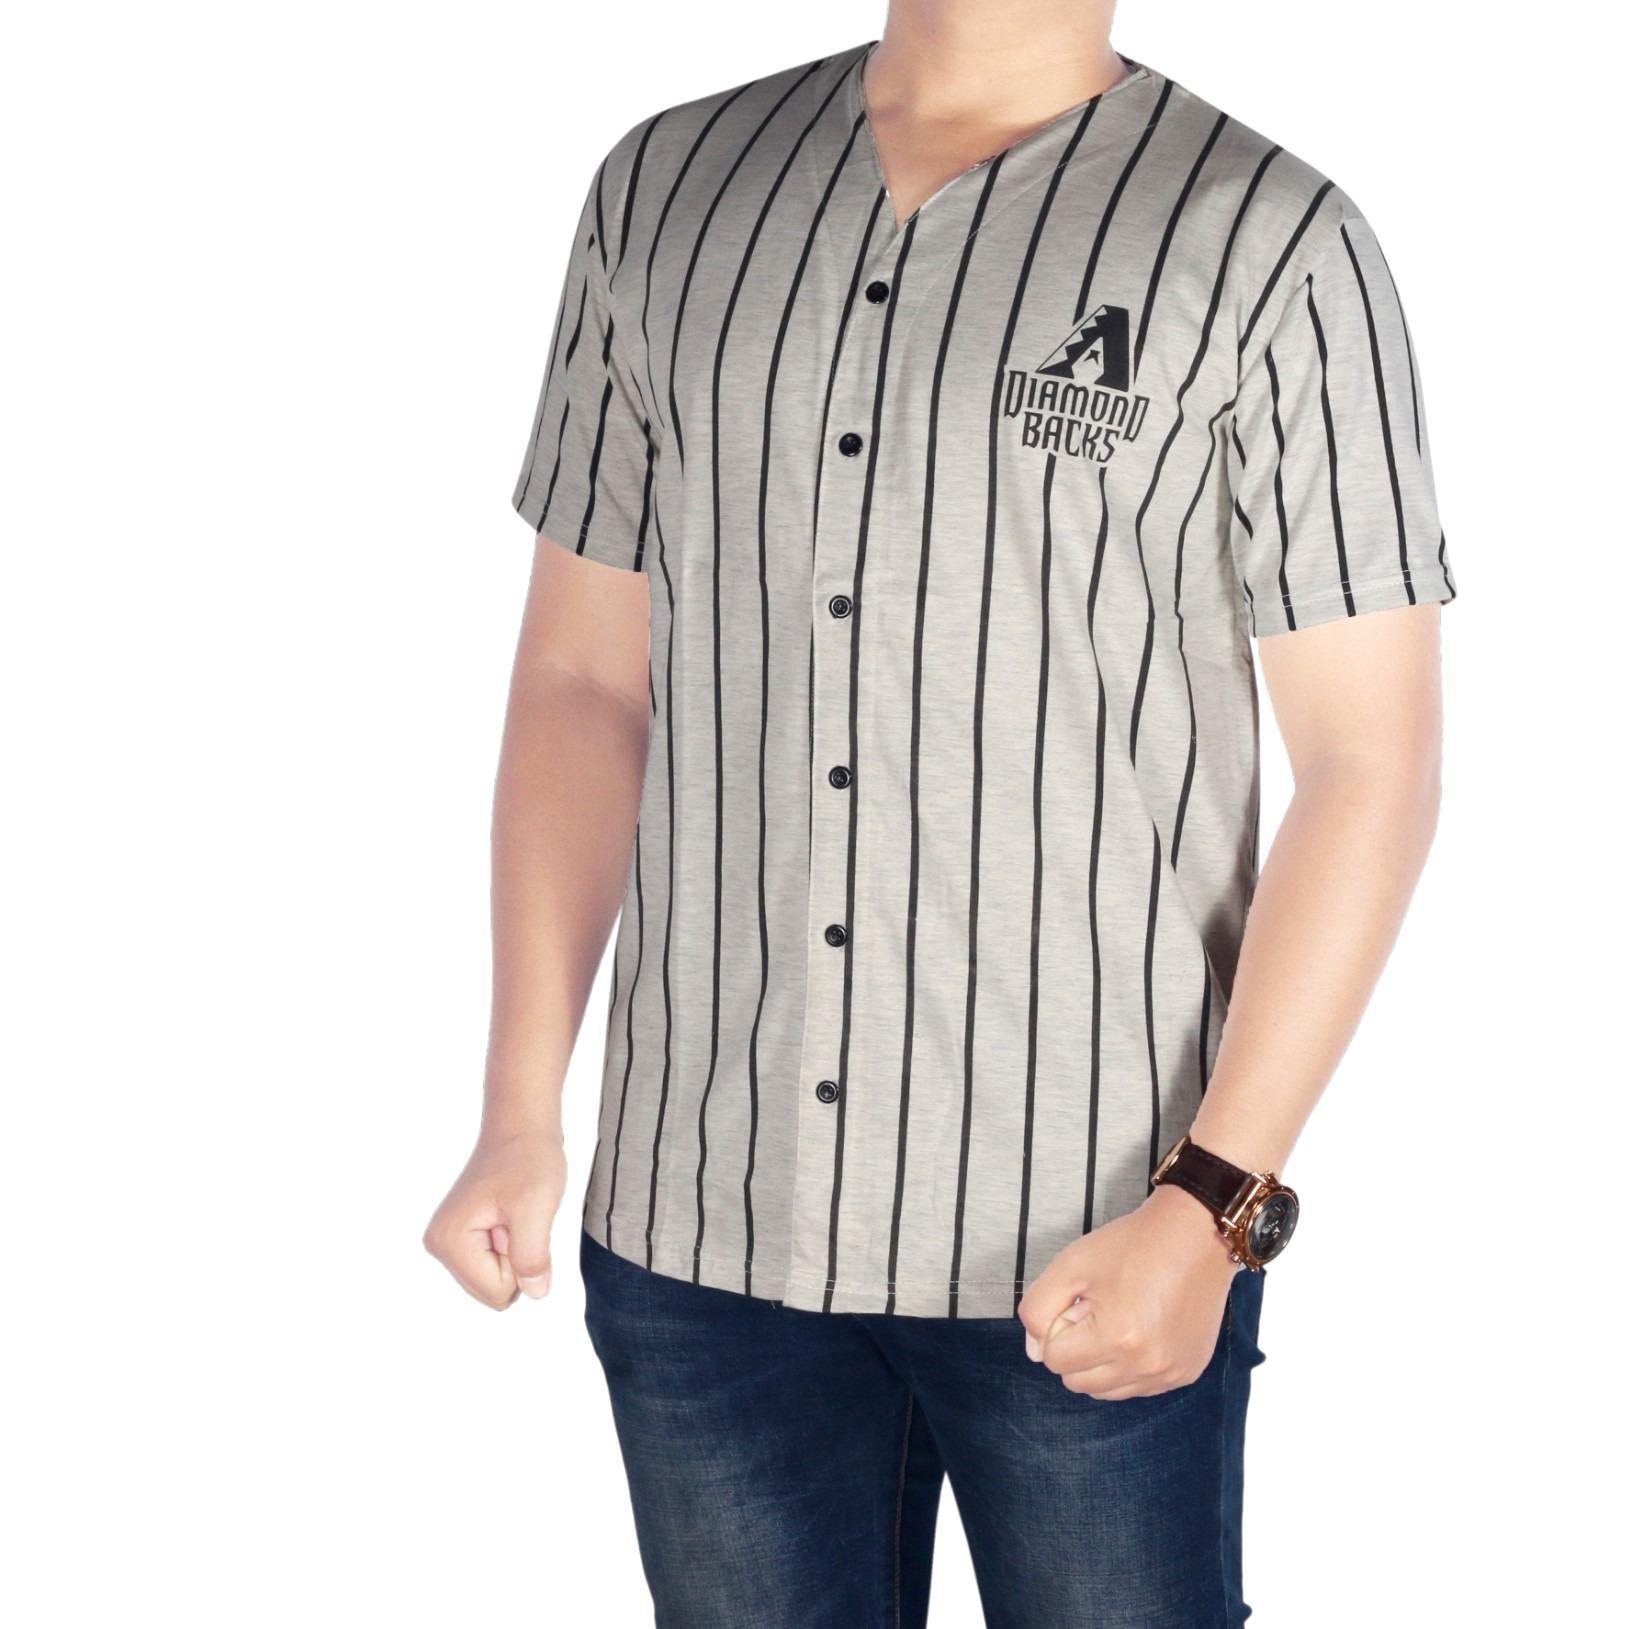 Dgm_Fashion1 Kaos Baseball Pria Kancing Abu-Abu/Kaos Disto Pria/Kaos Men/T-Shirt Man/Kaos Polos/Kaos Distro/Kaos Casual/Kaos Polo/Kaos Combet/Baju Kaos Pria/Kaos Young Lex/Kaos Long Line/Kaos Baseball/Kaos YOGS/Kaos Swag/Kaos Murah  NS 5430